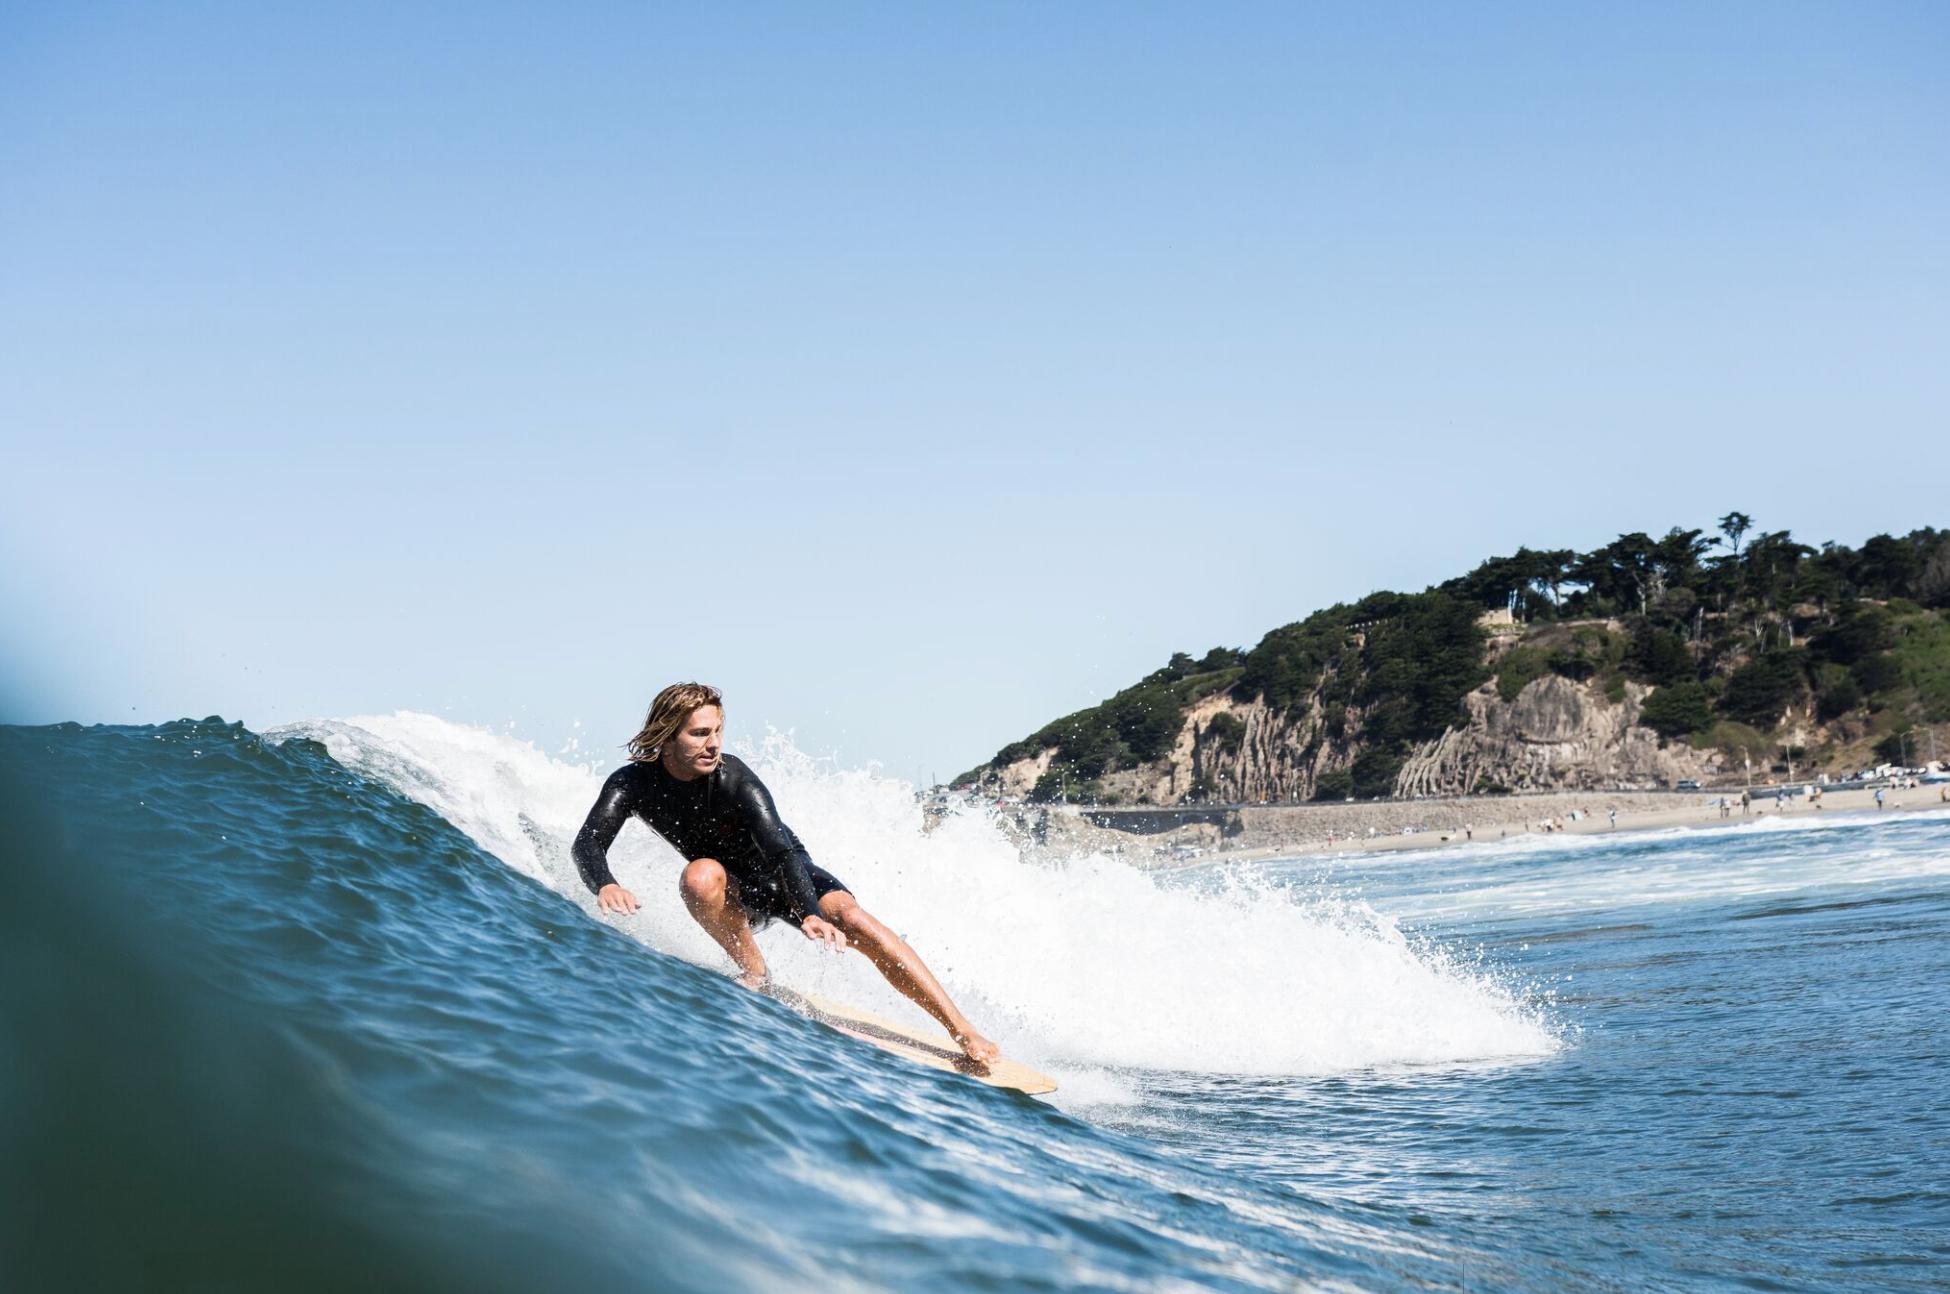 neil_messmer_longboard_california_saltwater_1